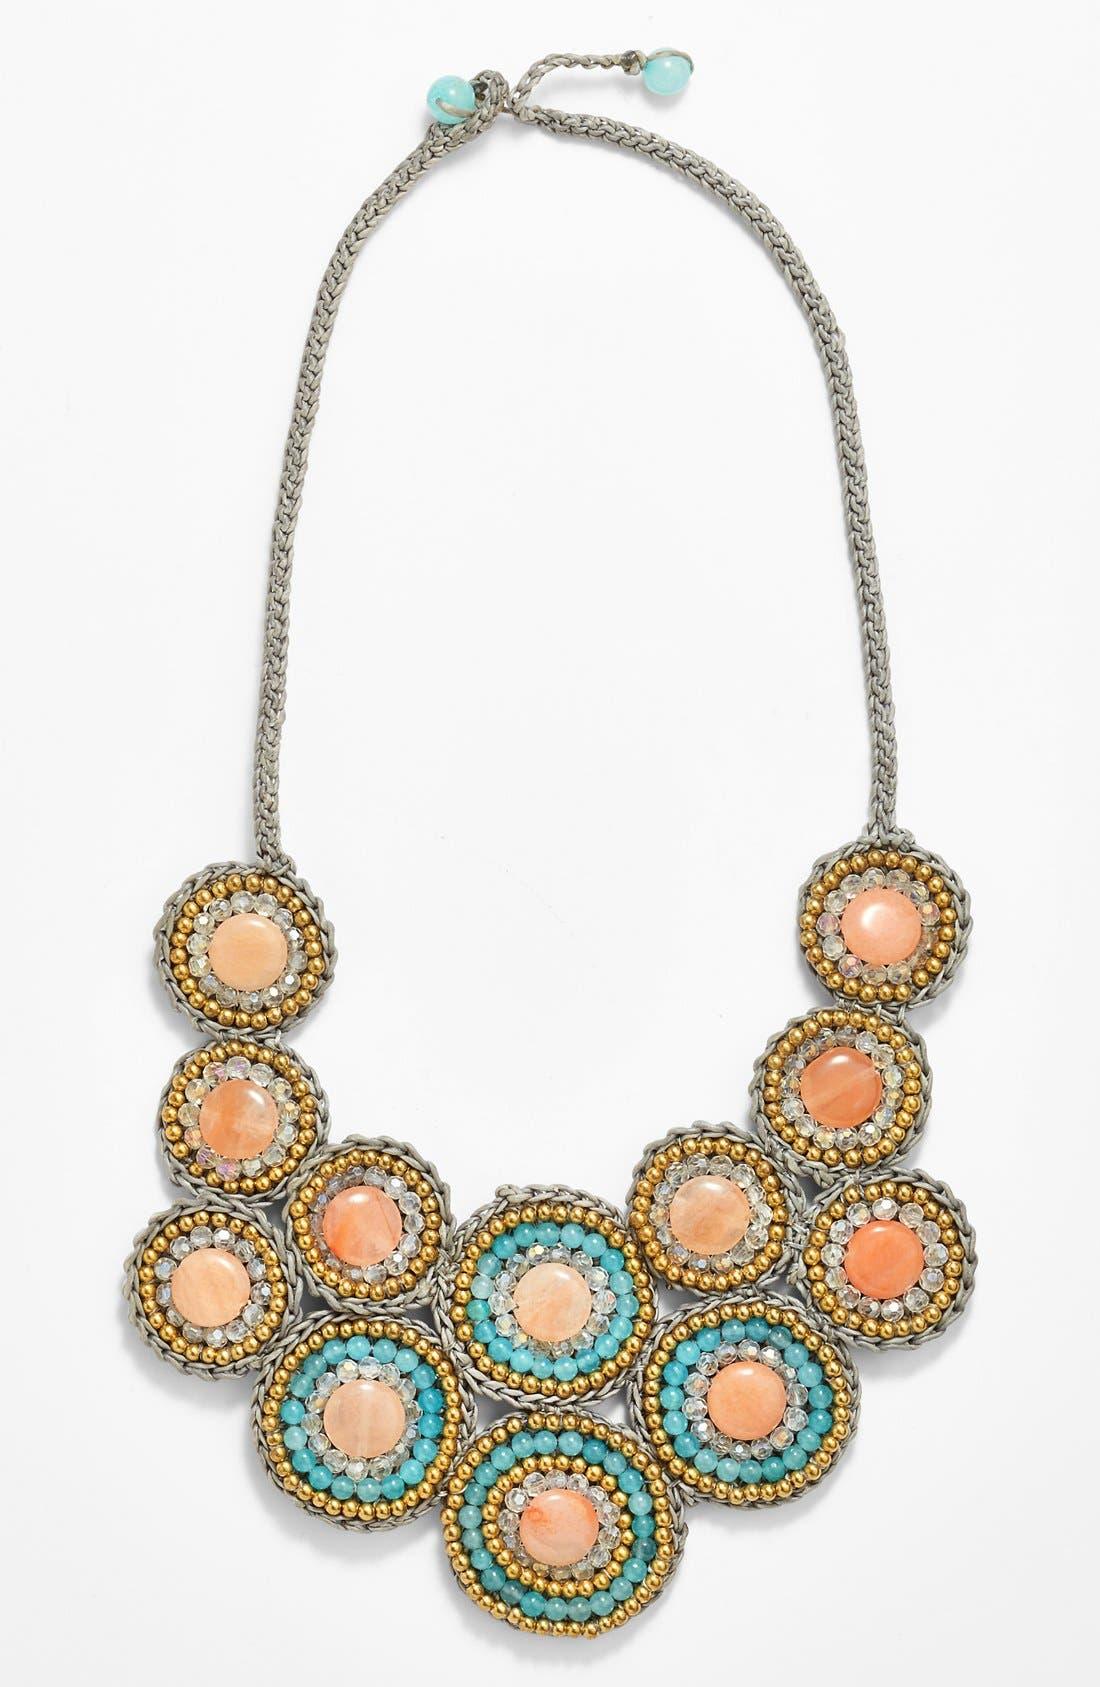 Alternate Image 1 Selected - Panacea Stone Bib Necklace